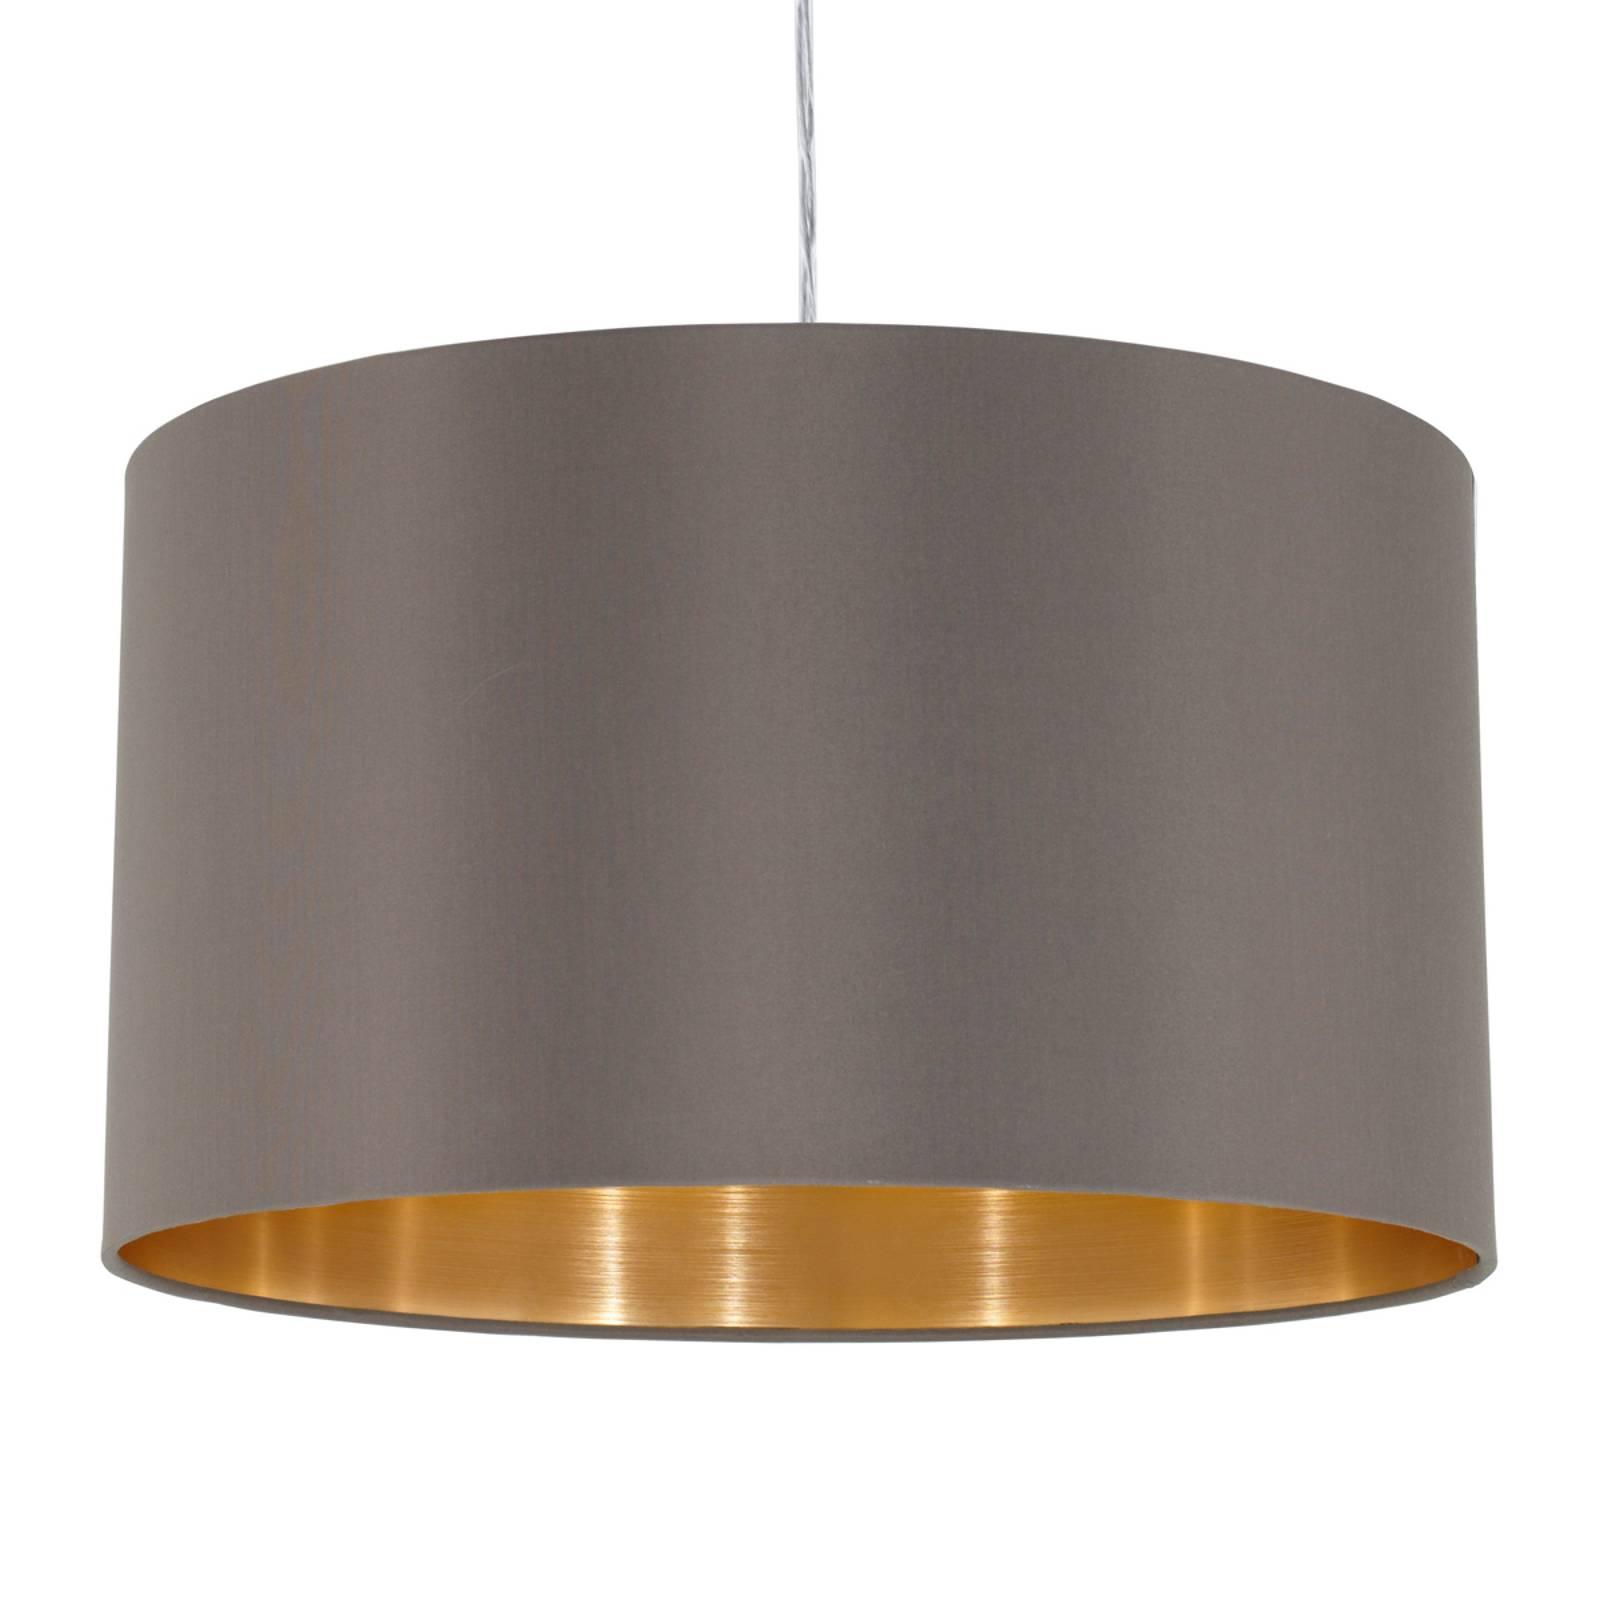 Textiel-hanglamp Maserlo, cappuccino, 38 cm